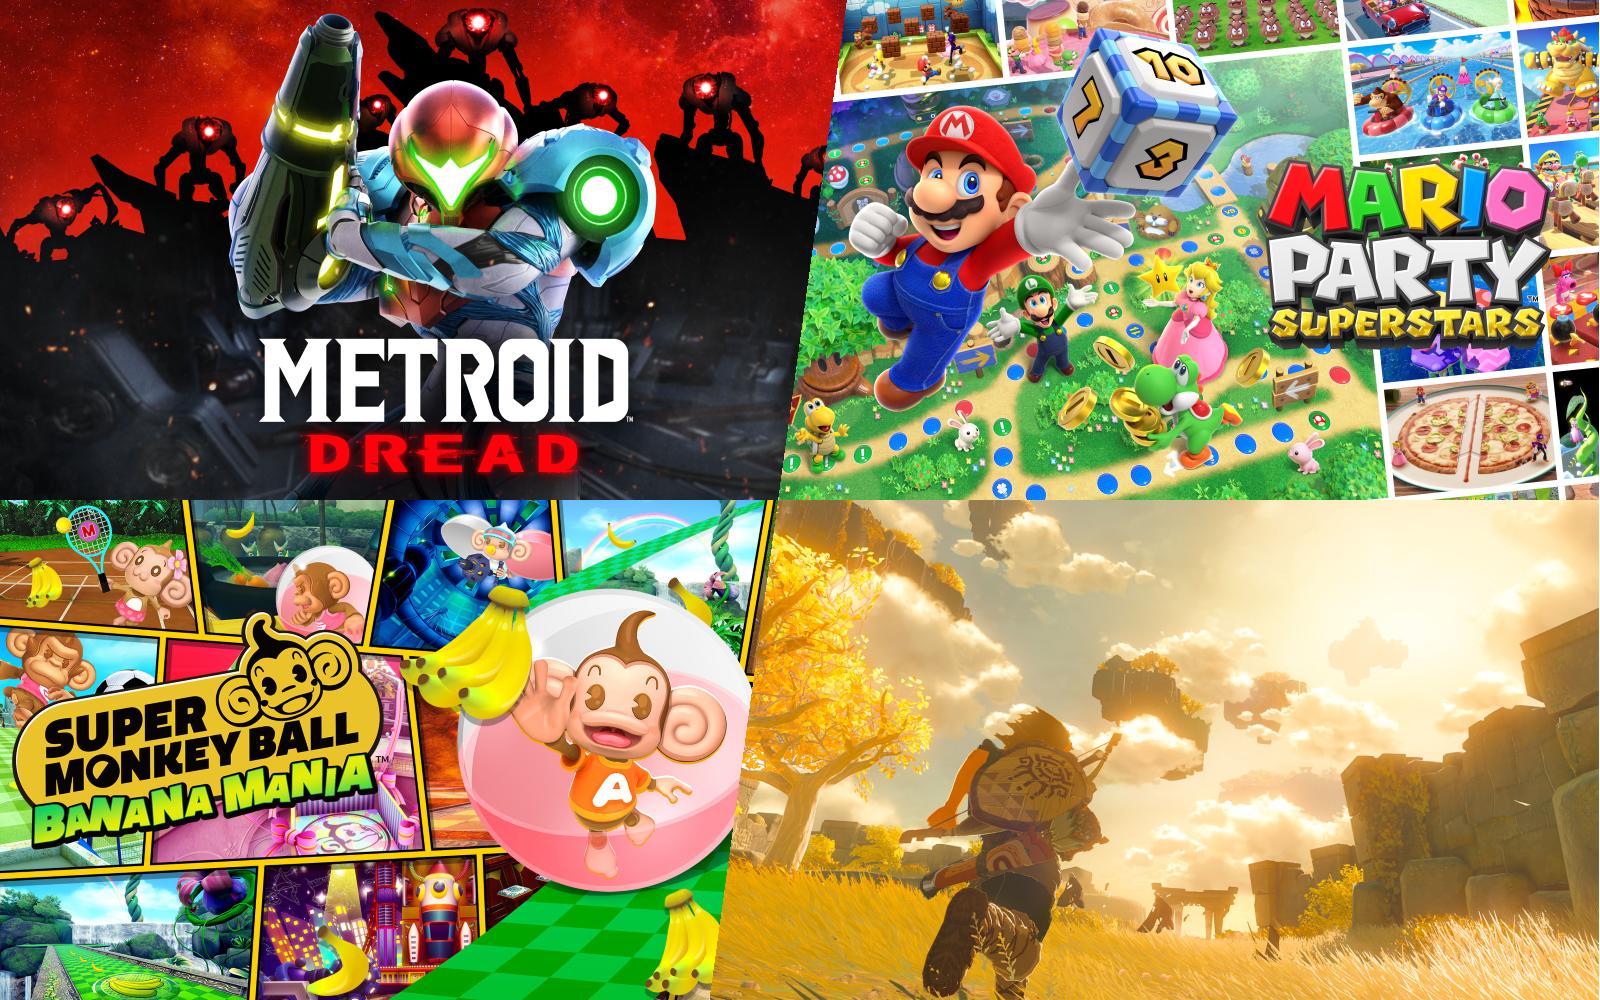 Nintendo E3 2021 Direct Re-Cap